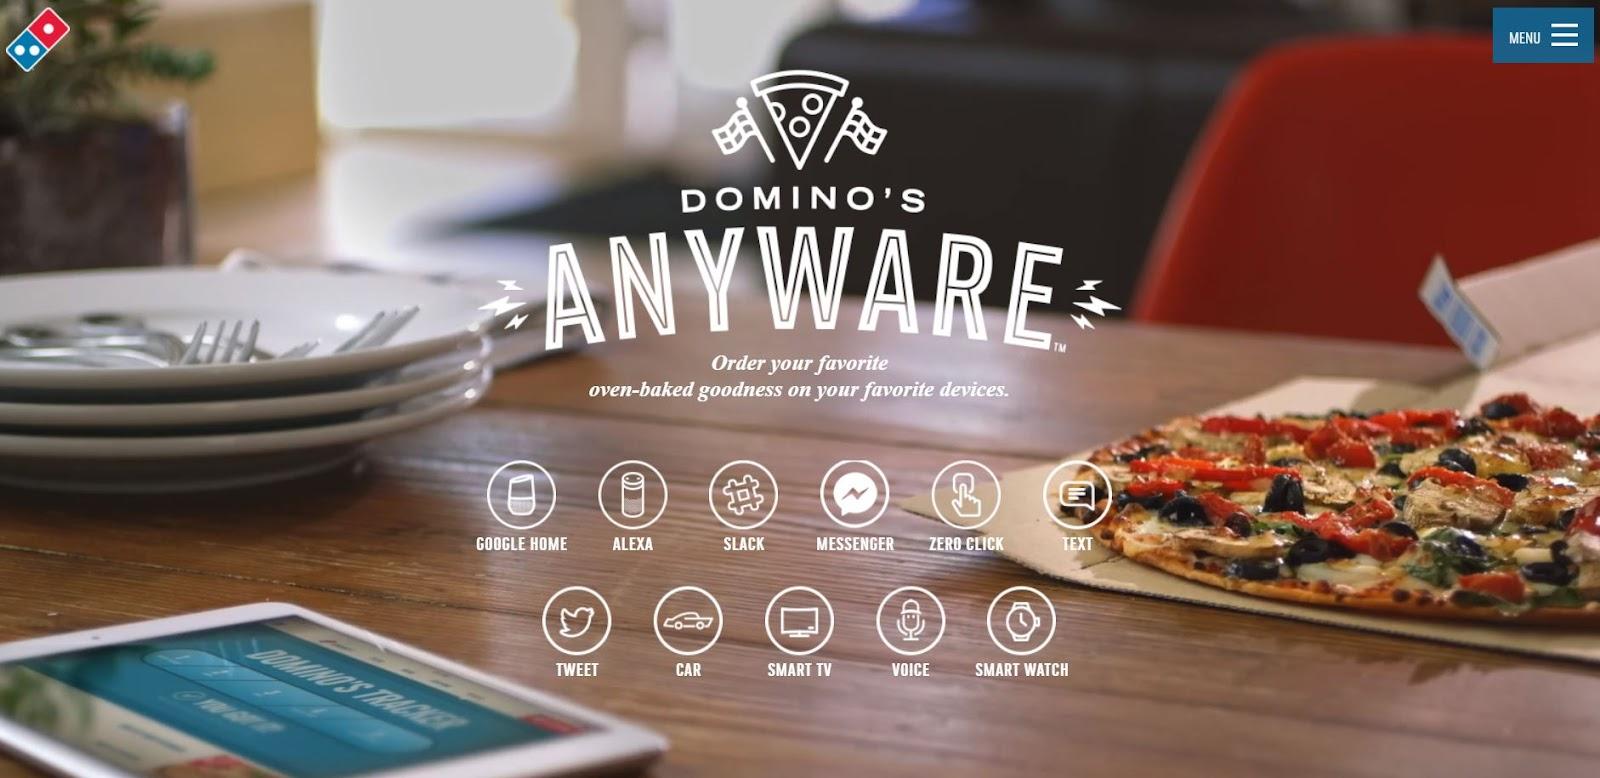 Domino's pizza ordering site